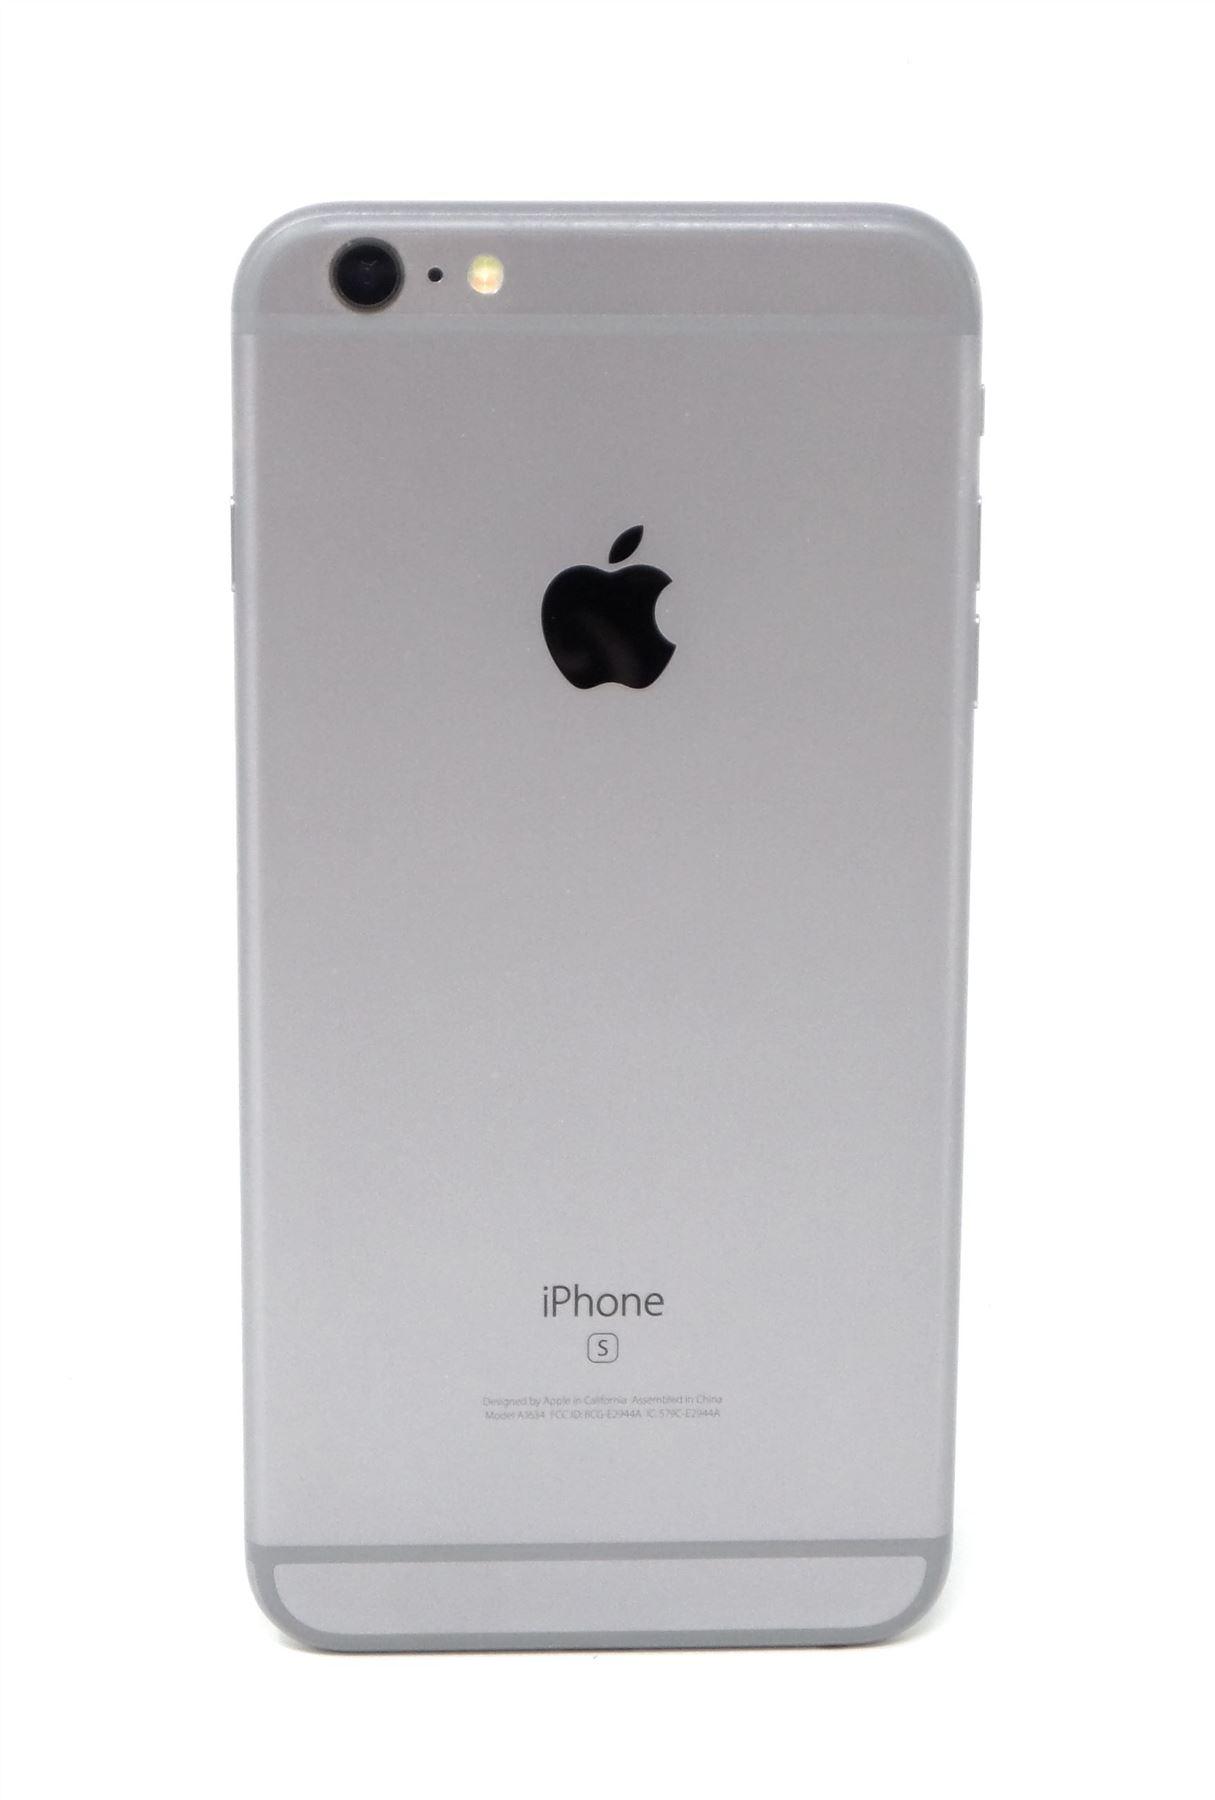 Apple-iPhone-6S-Plus-Carrier-Options-AT-amp-T-T-Mobile-Verizon-Unlocked-16-64-128GB thumbnail 22